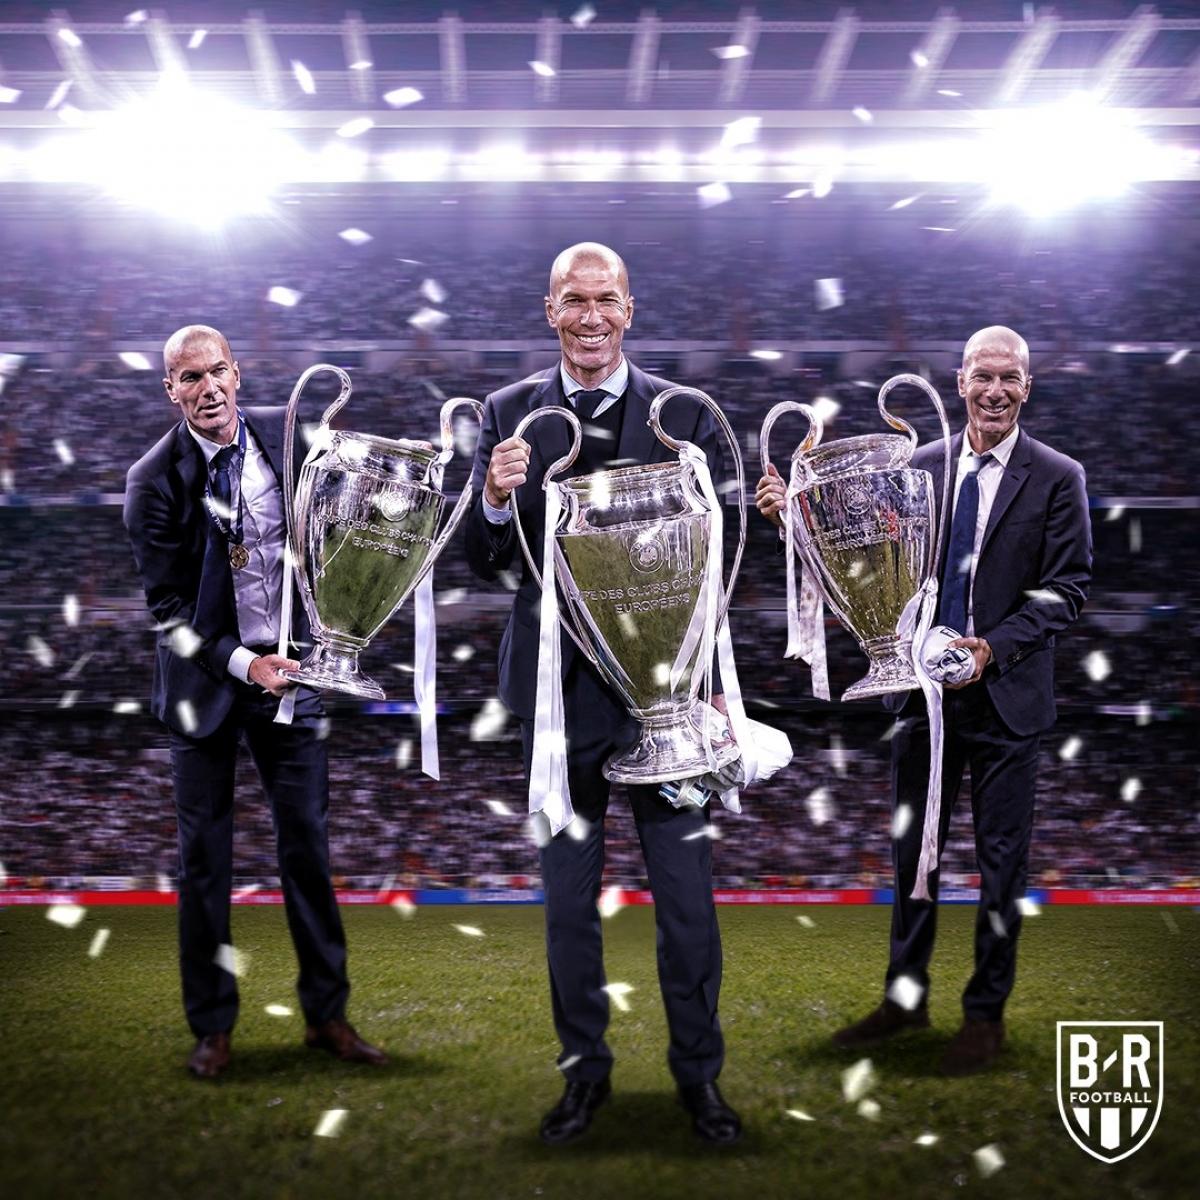 Zinedine Zidane cán mốc 50 trận cầm quân ở Champions League. (Ảnh: Bleacher Reports)